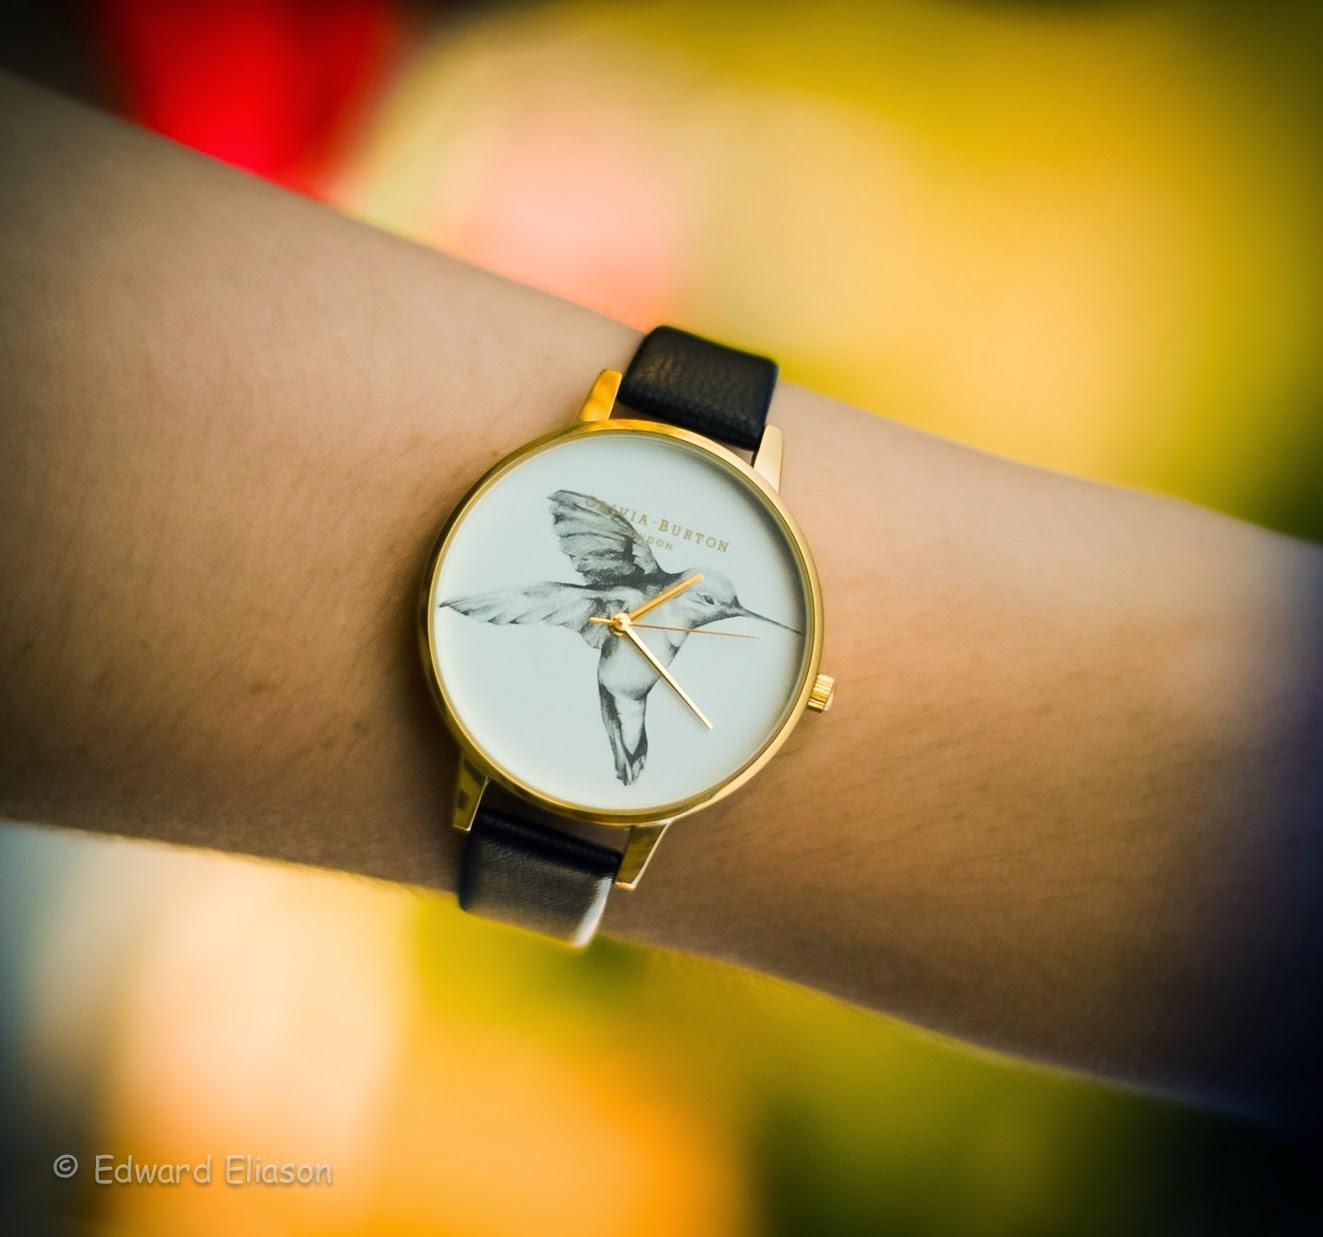 olivia burton watch, hummingbird watch, mod cloth watch, photography, expensive watches,